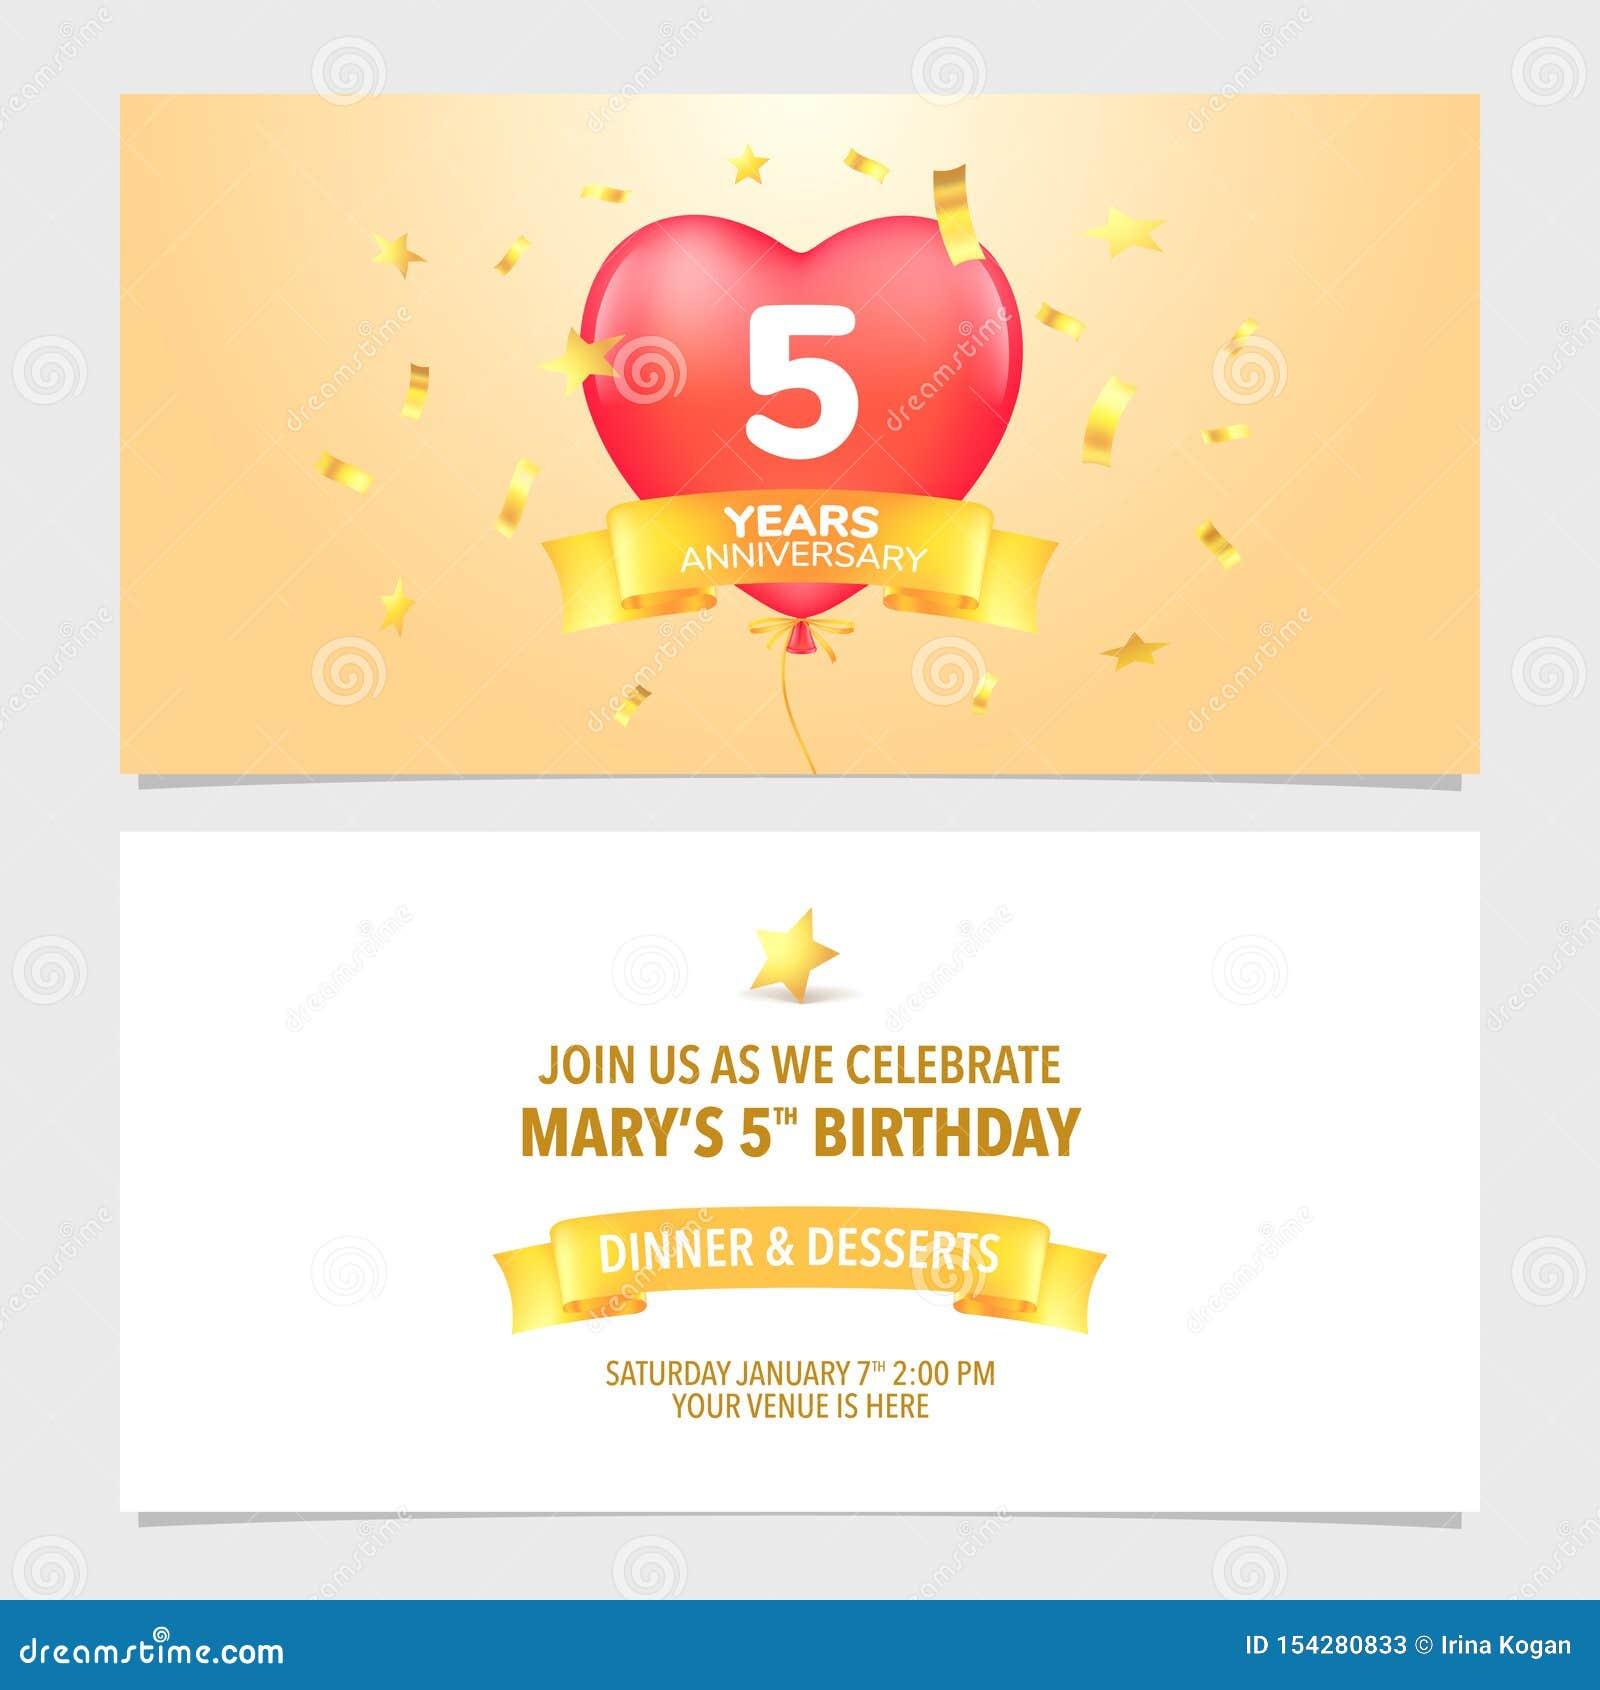 5 Years Anniversary Invitation Card Vector Illustration